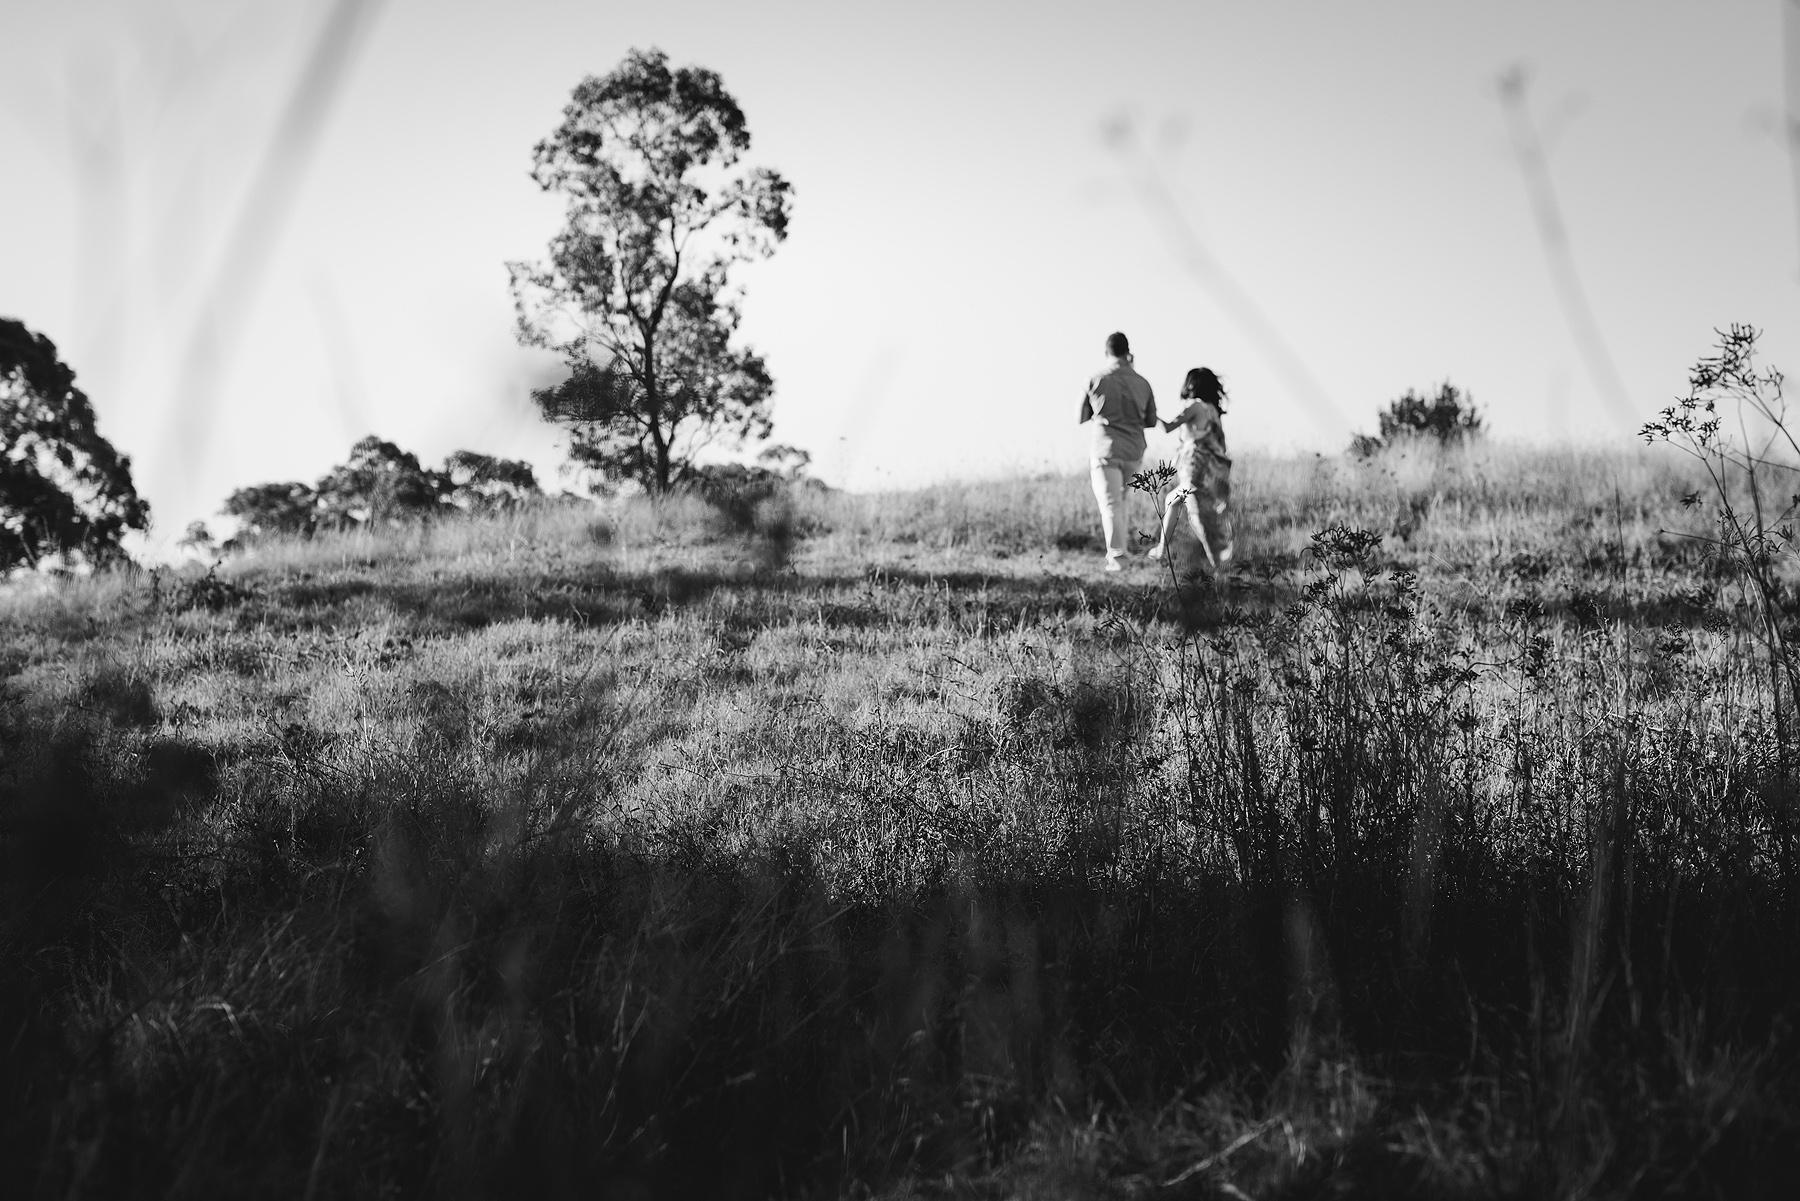 hills-district-family-photographer-CINDY-CAVANAGH (38 of 70) copy.jpg